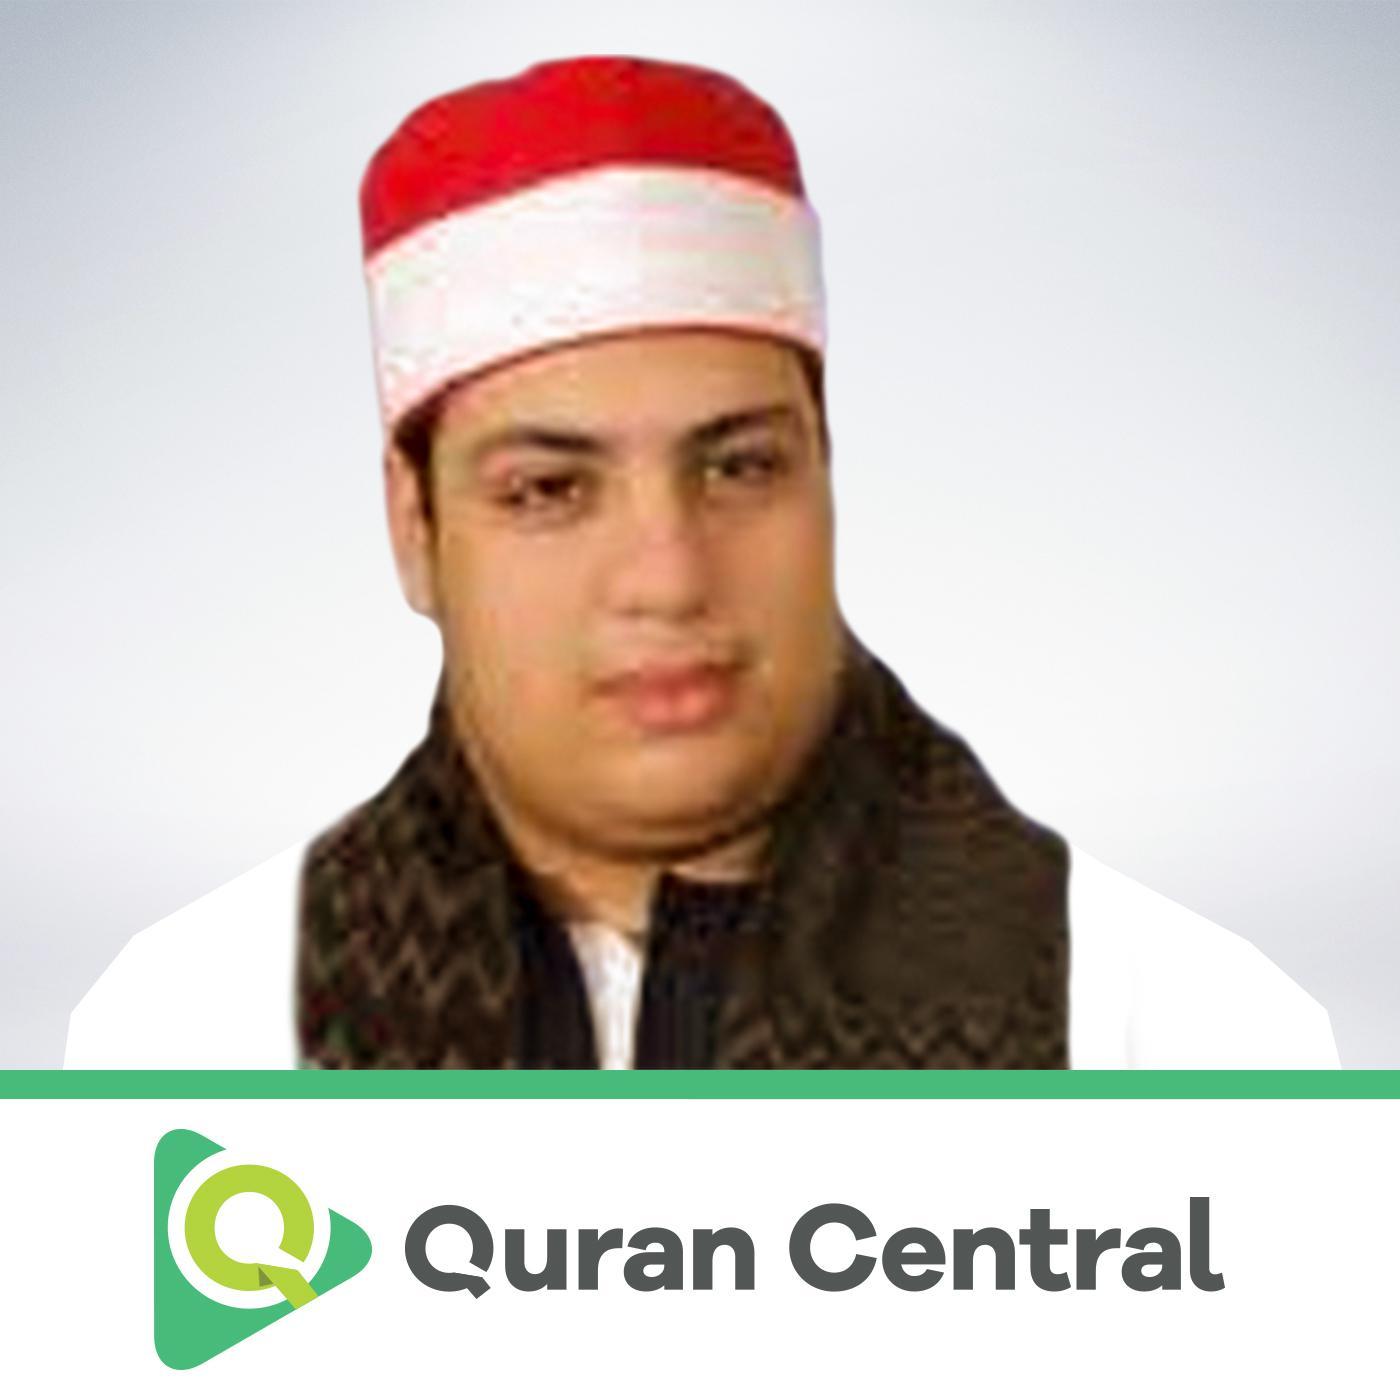 Mohammed Abdalbari